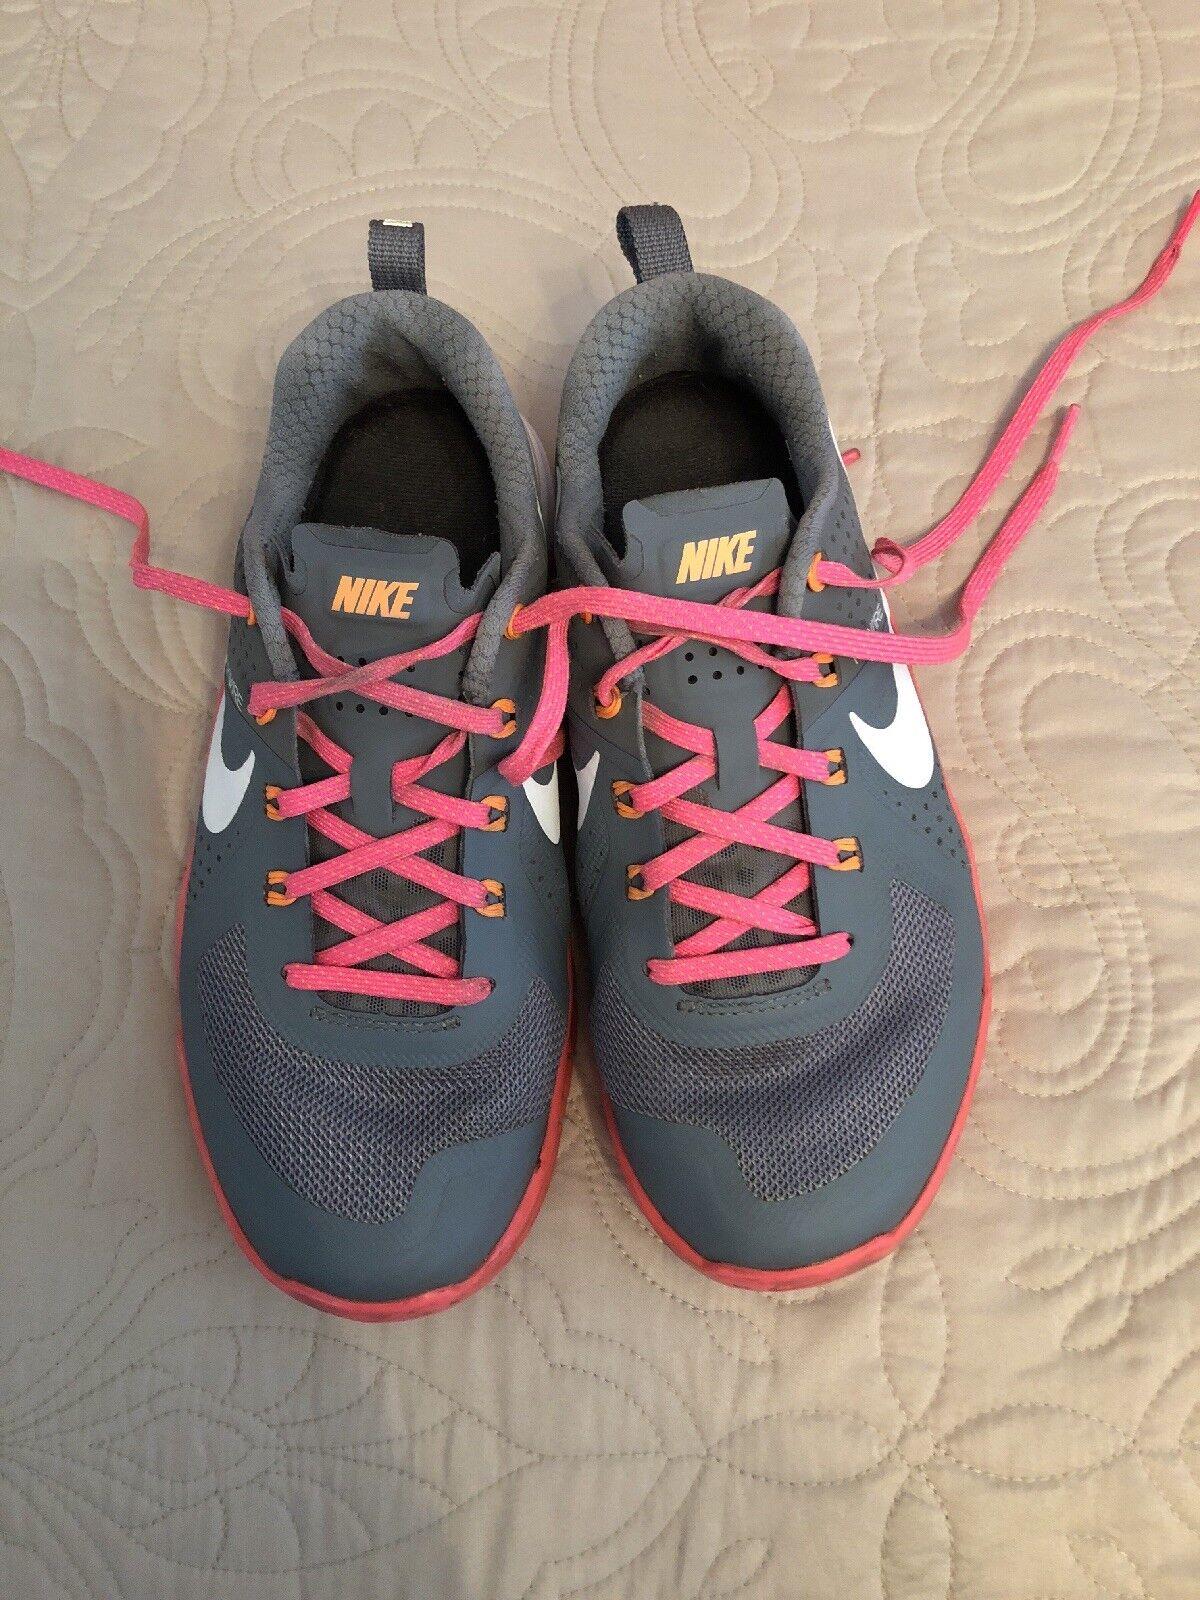 Womens Nike Metcon Size 6 Pink/Gray